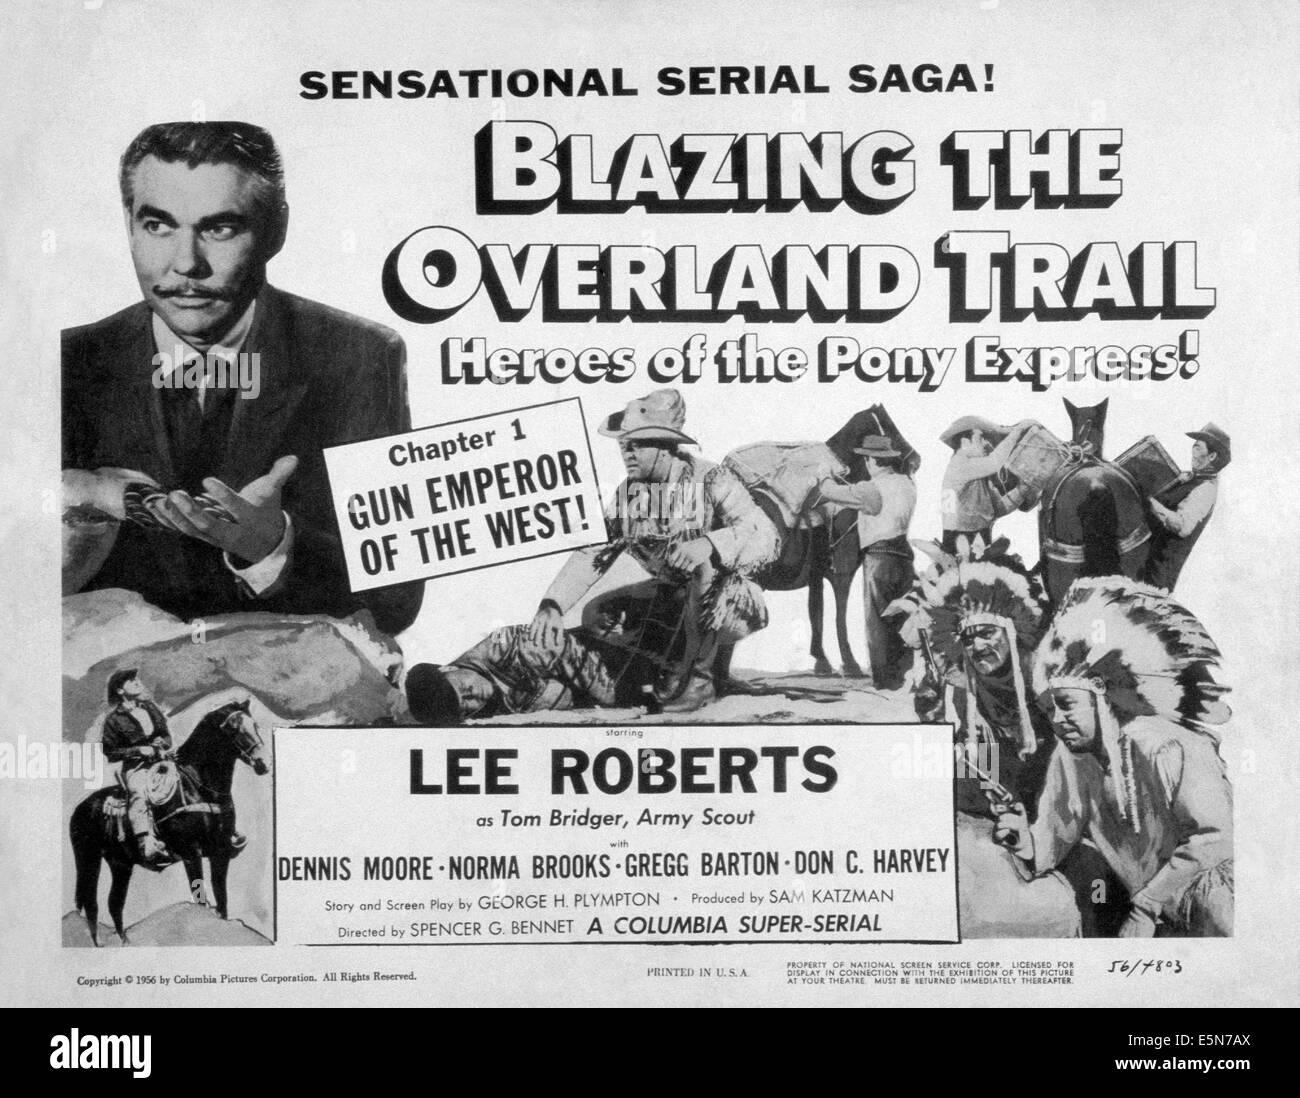 BLAZING THE OVERLAND TRAIL, Lee Roberts (kneeling), 1956 - Stock Image